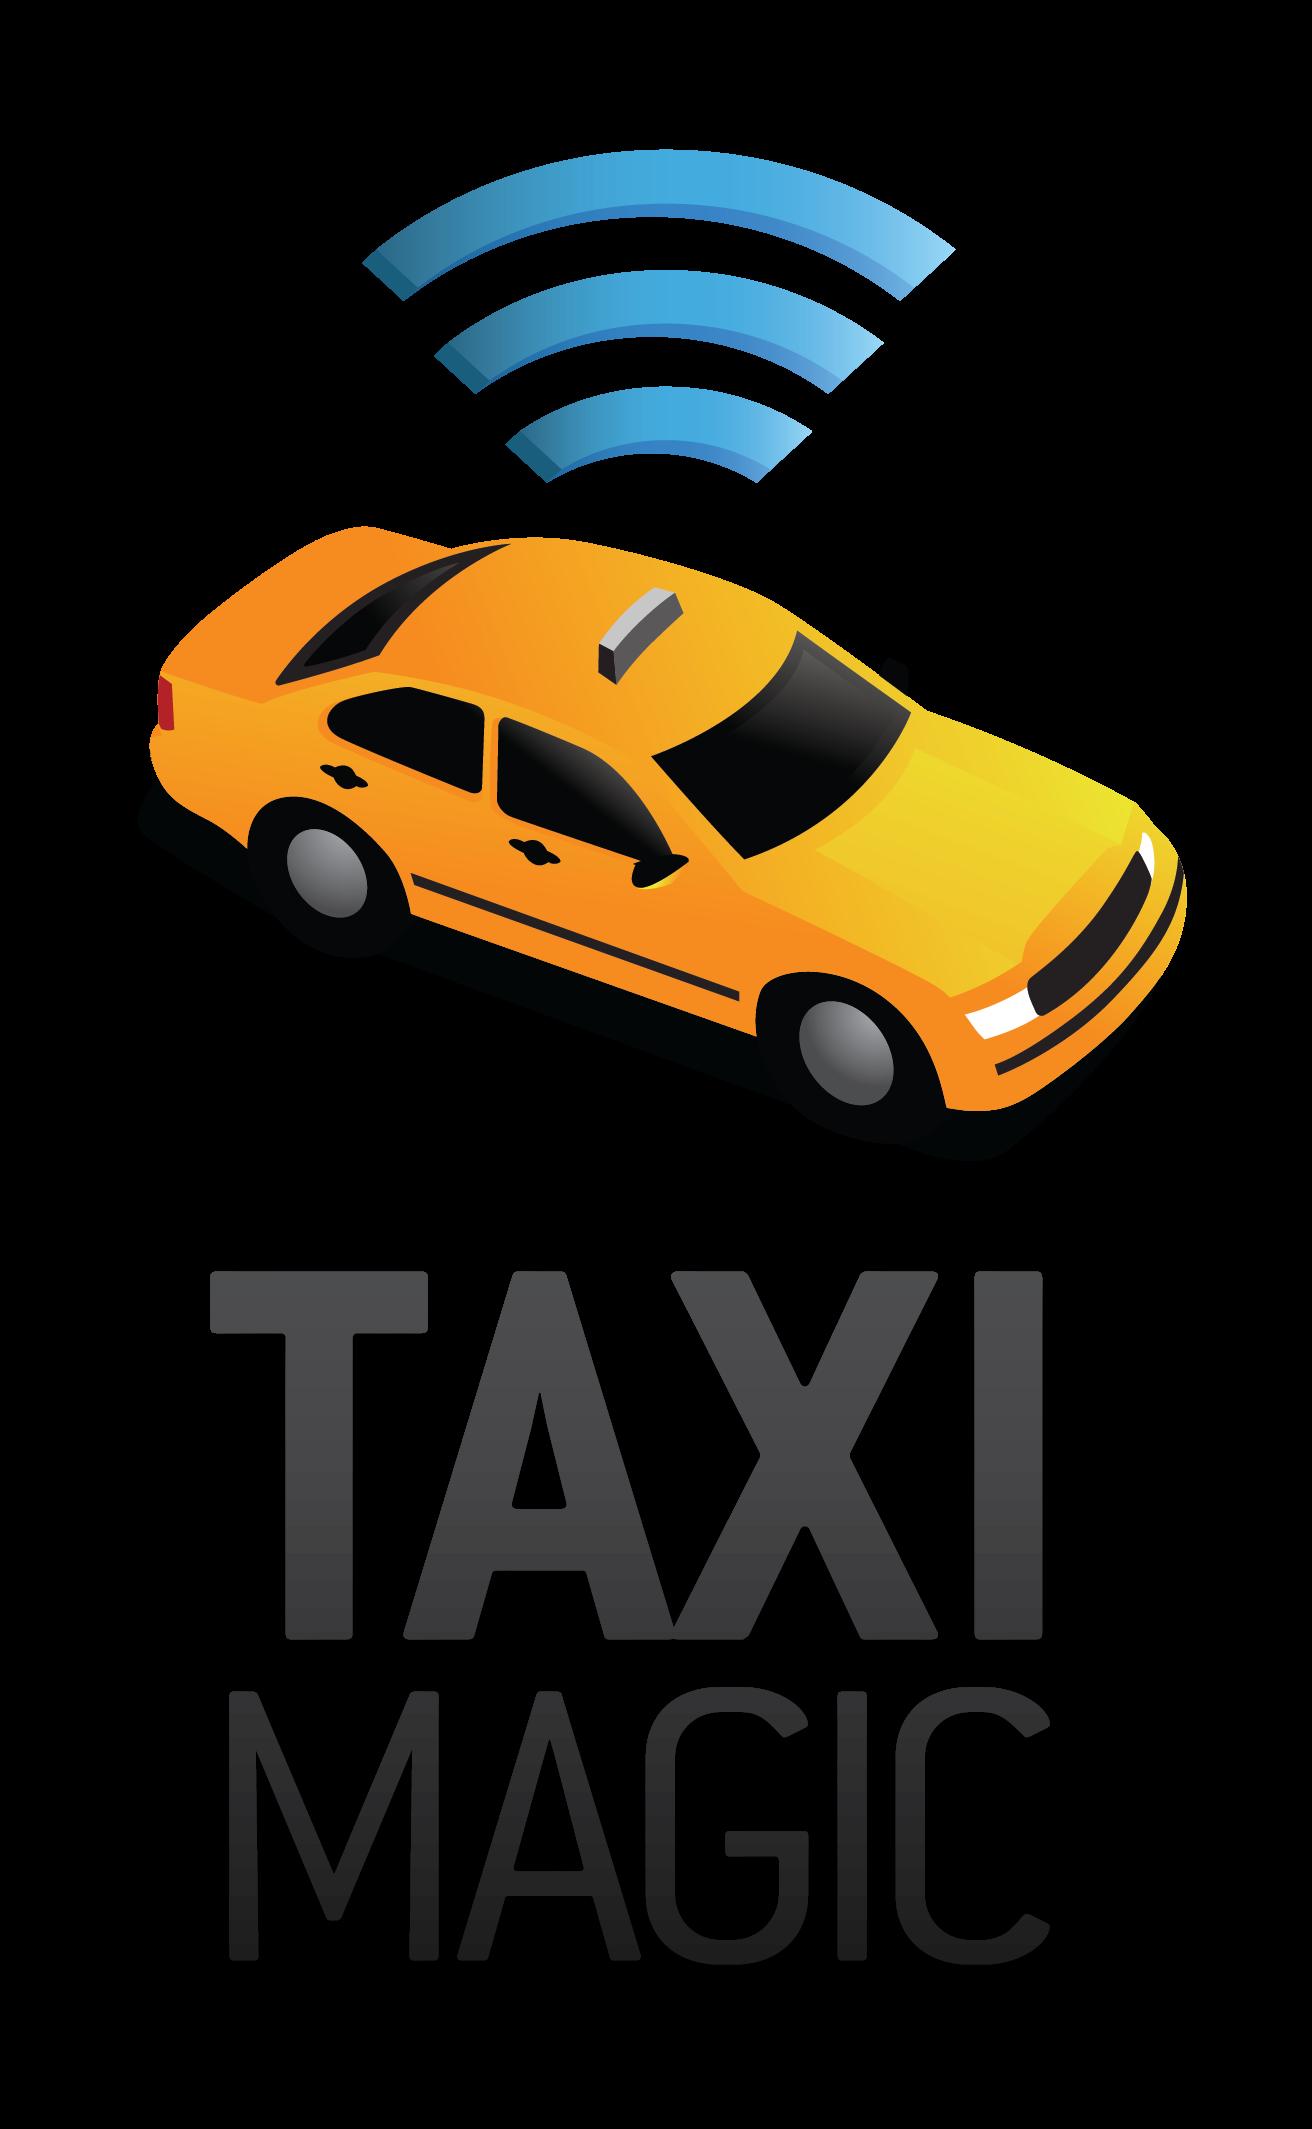 #TaxiMagic #Travel #LosAngeles #MC #sponsored